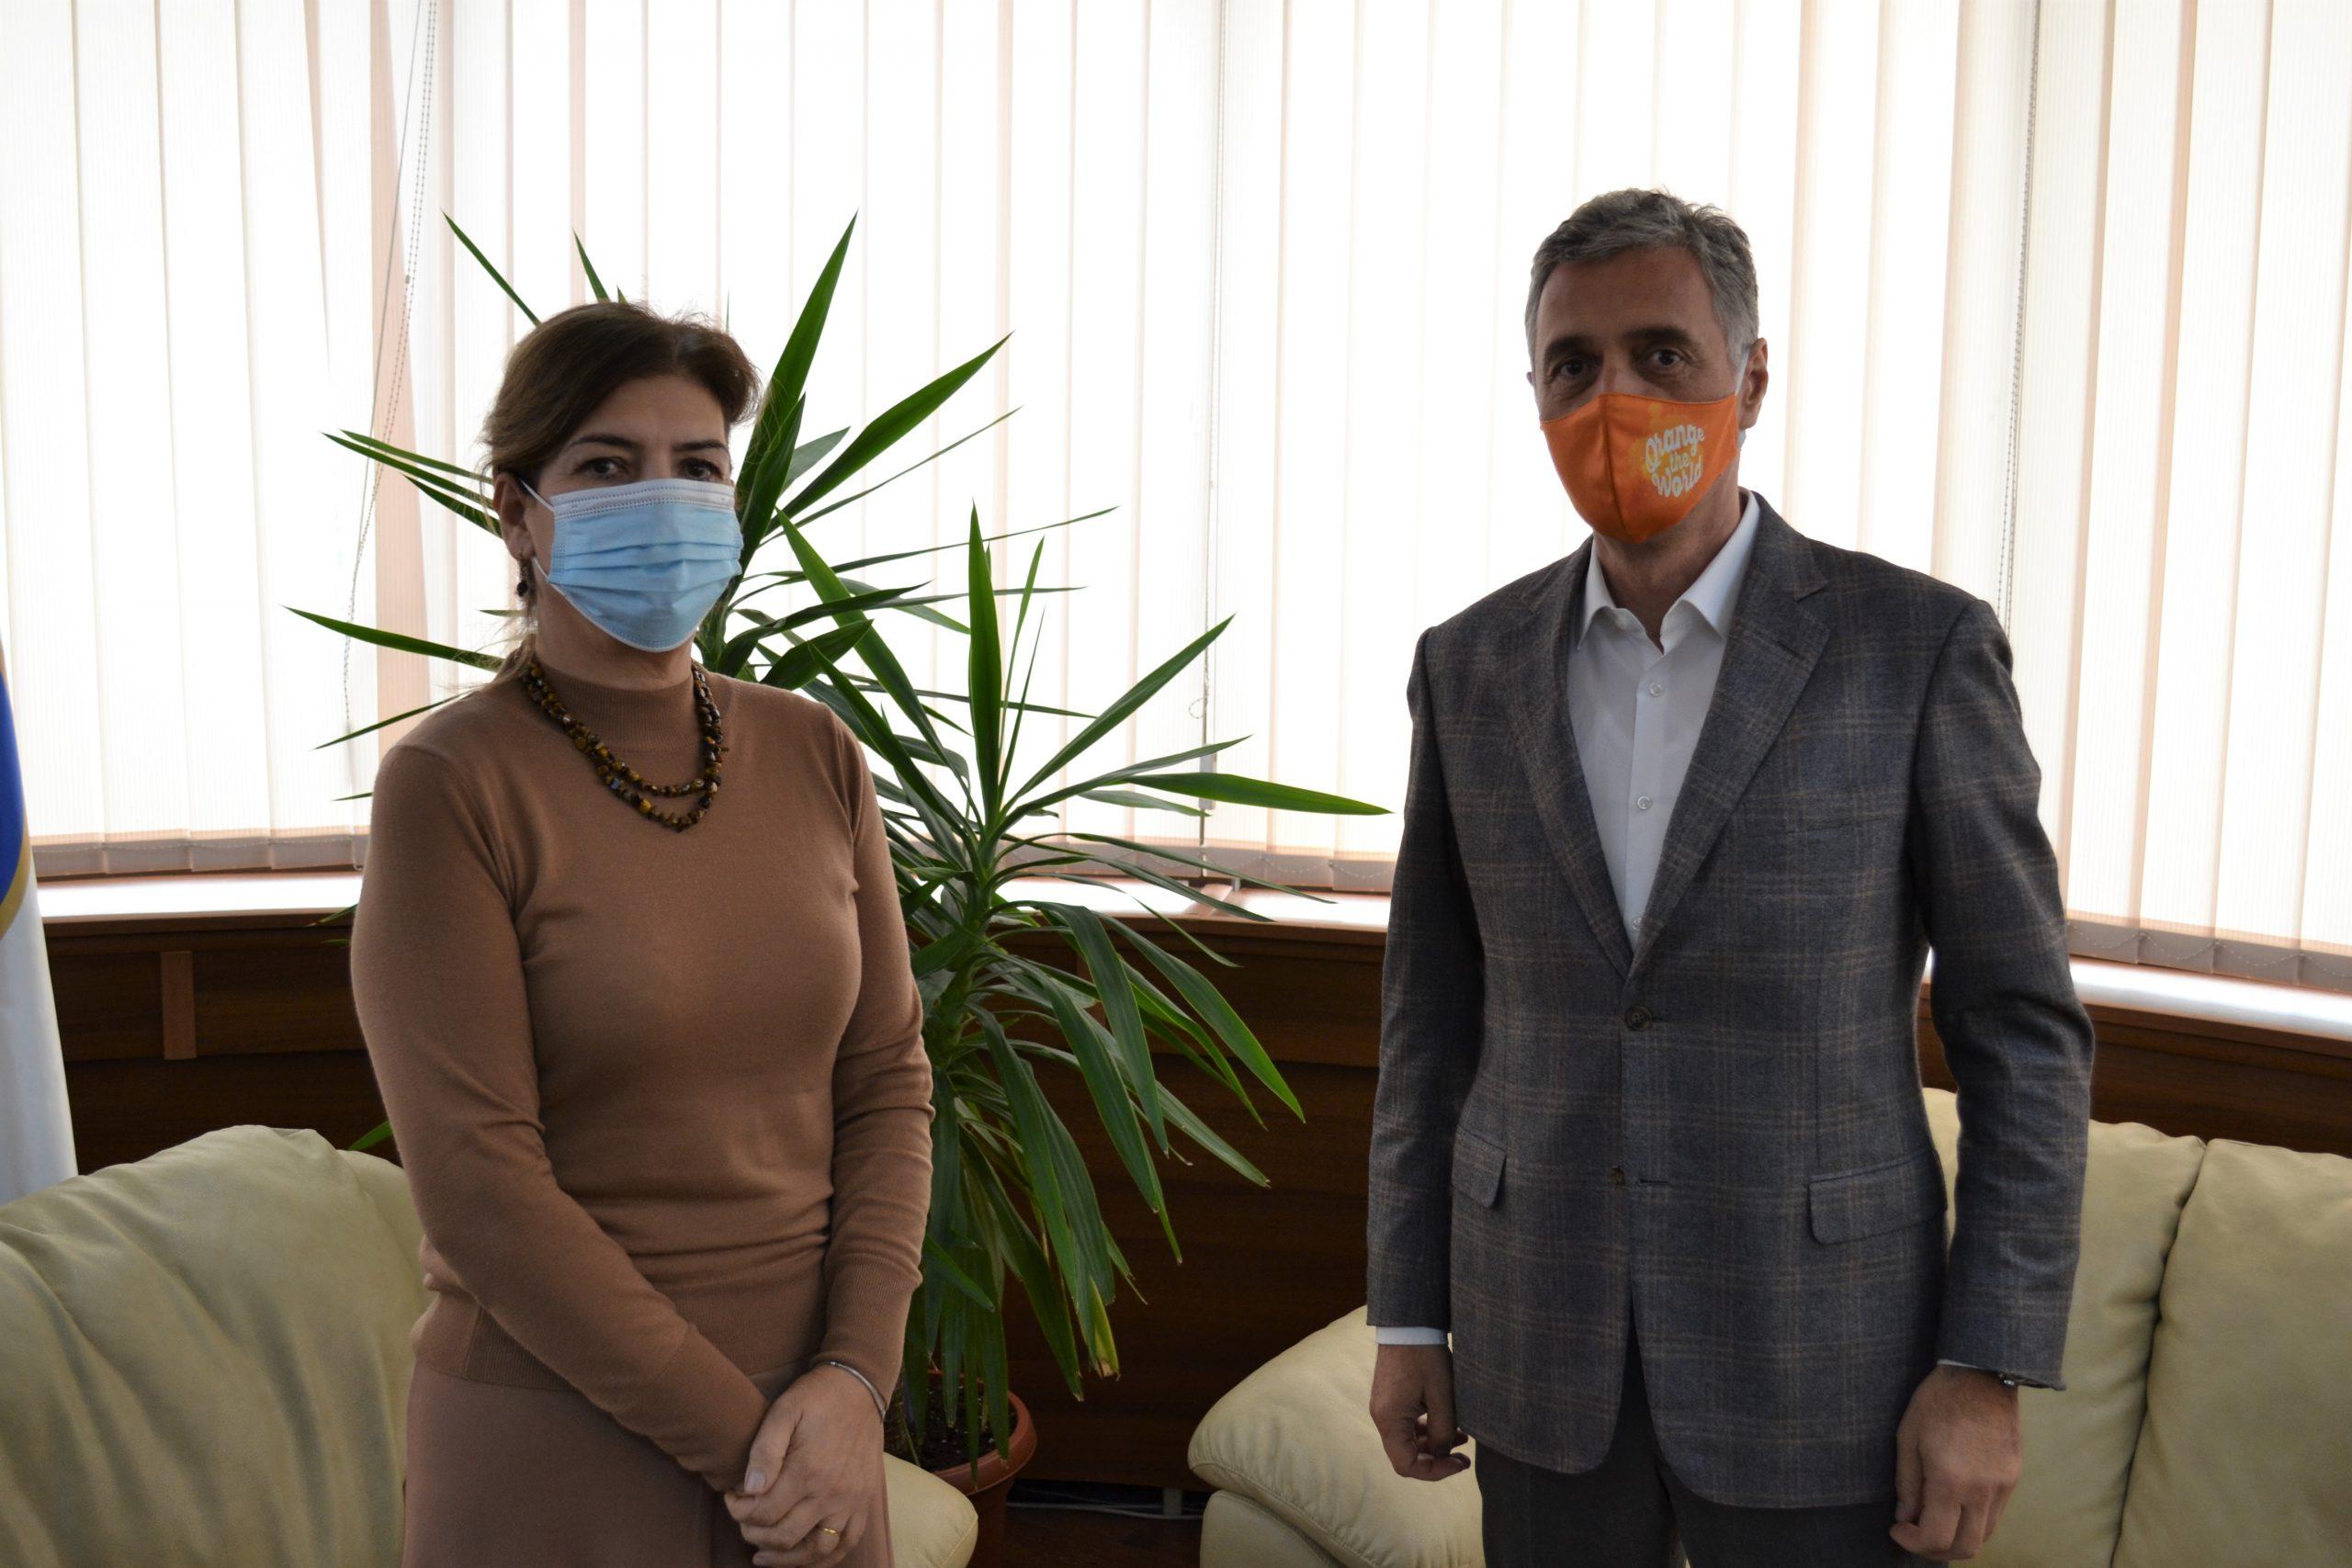 Kryetarja e KQZ-se, Daka priti ne takim Kryeprokurorin Lumezi